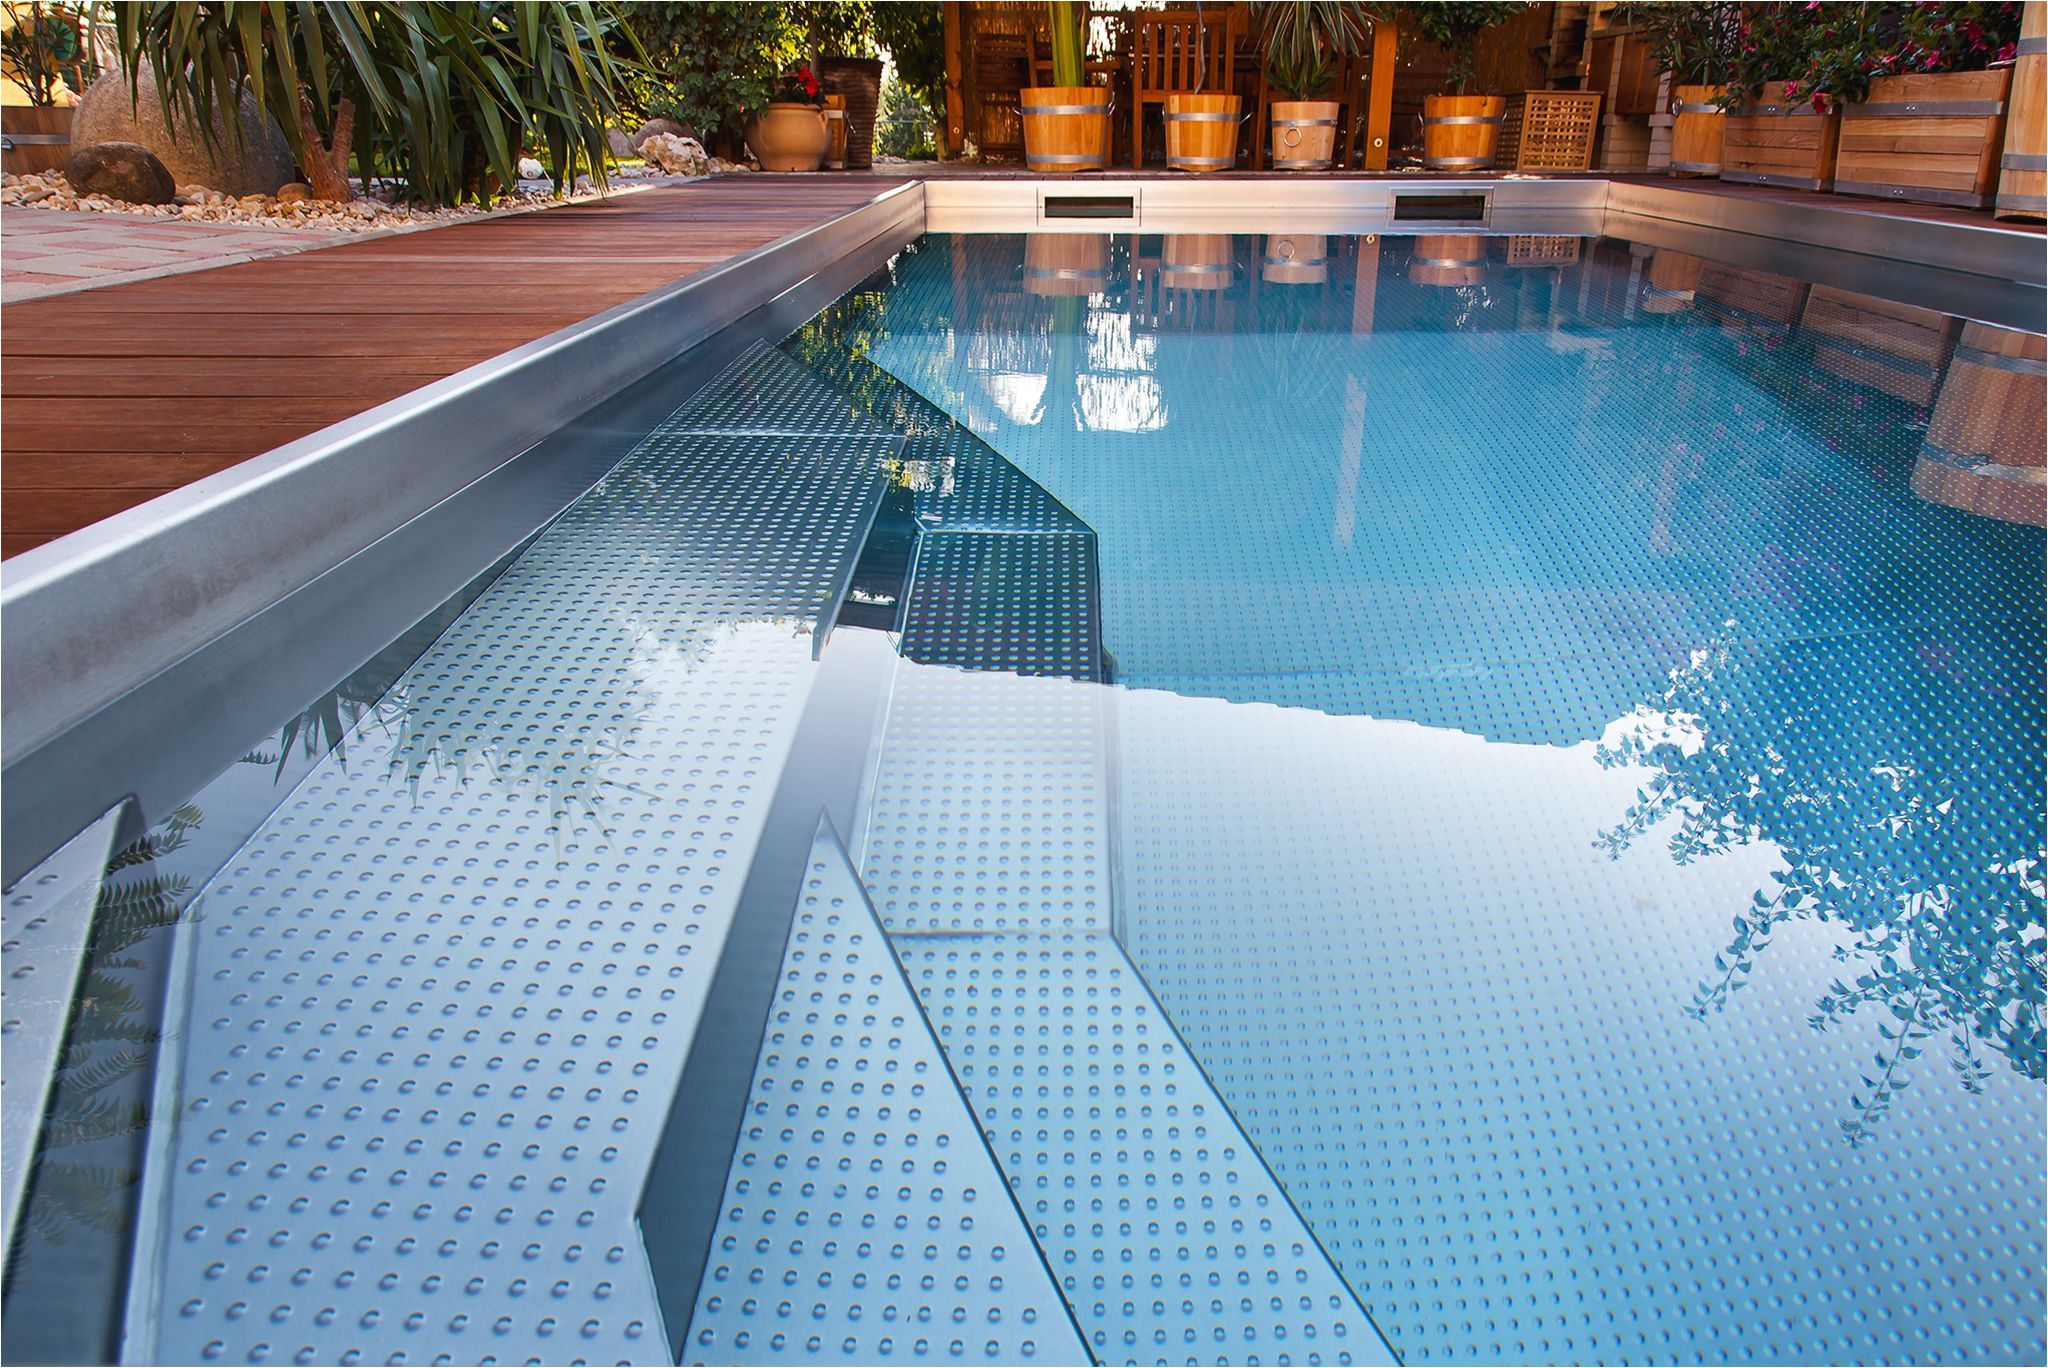 detail of stainless steel pool